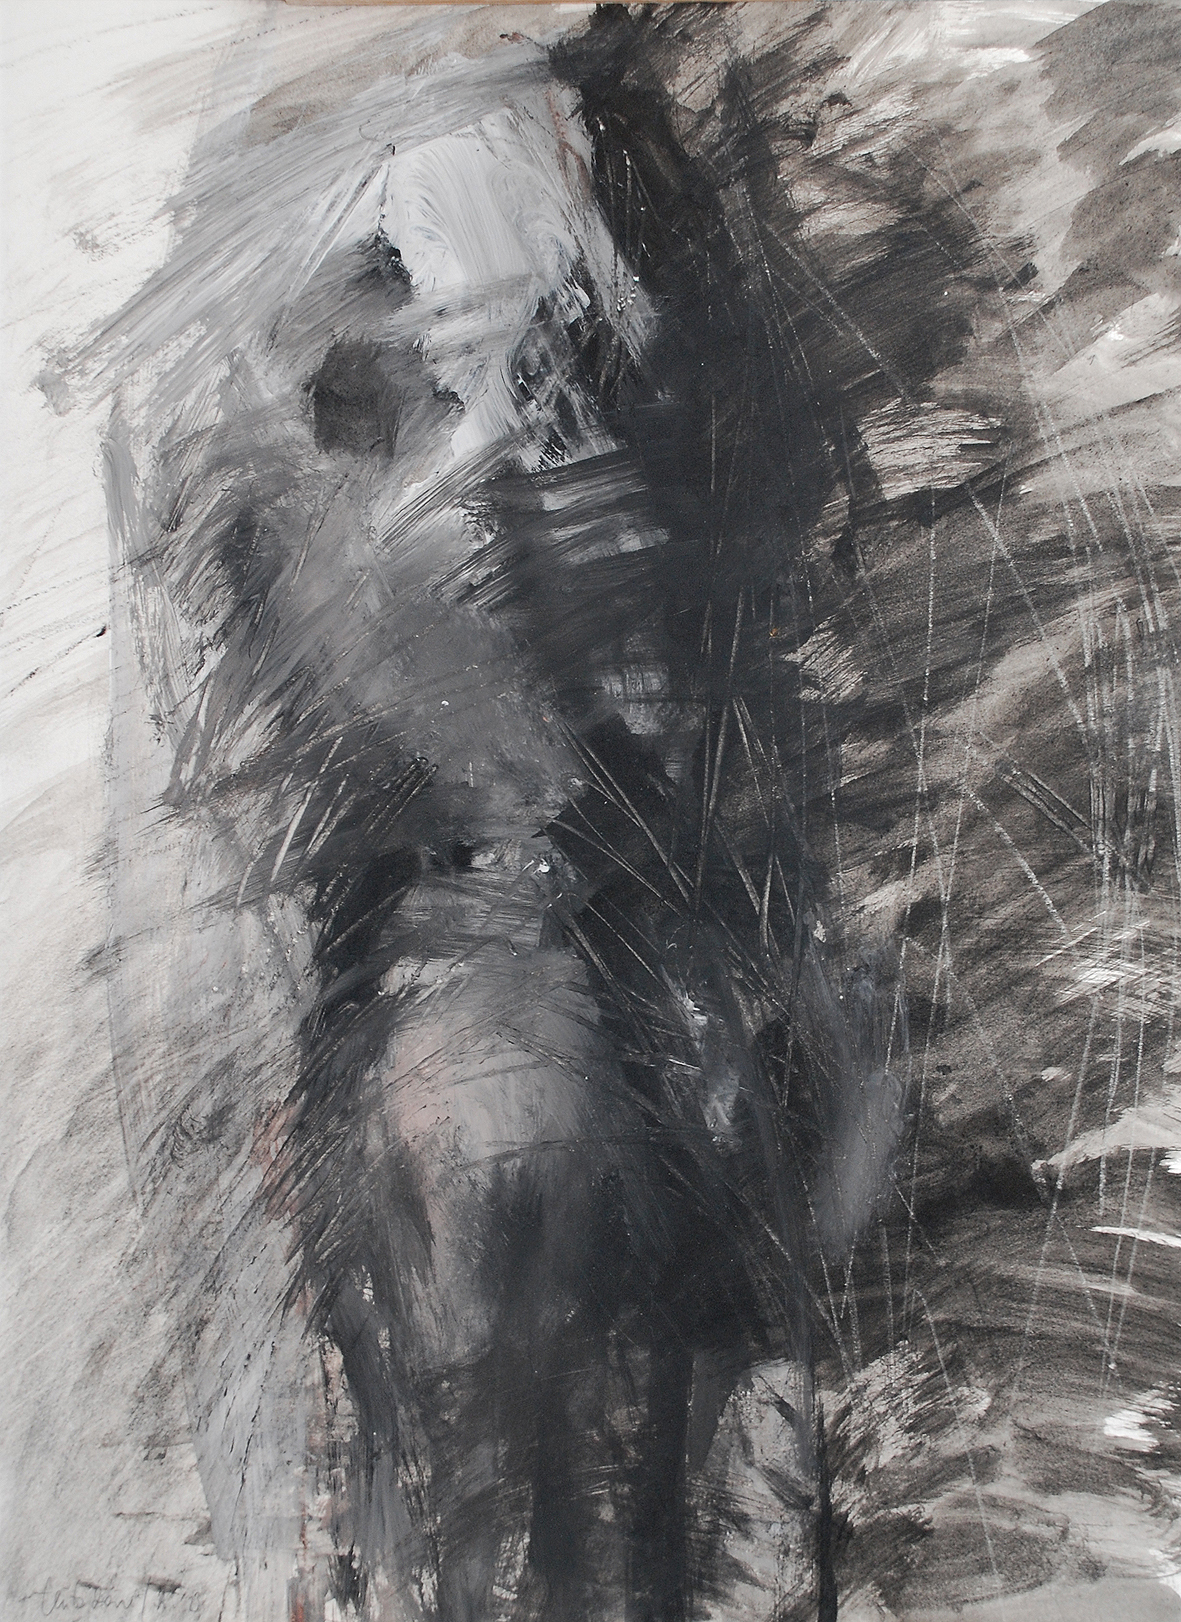 2. motiv, 46 x 35 cm, schwarze tusche, acryl/karton